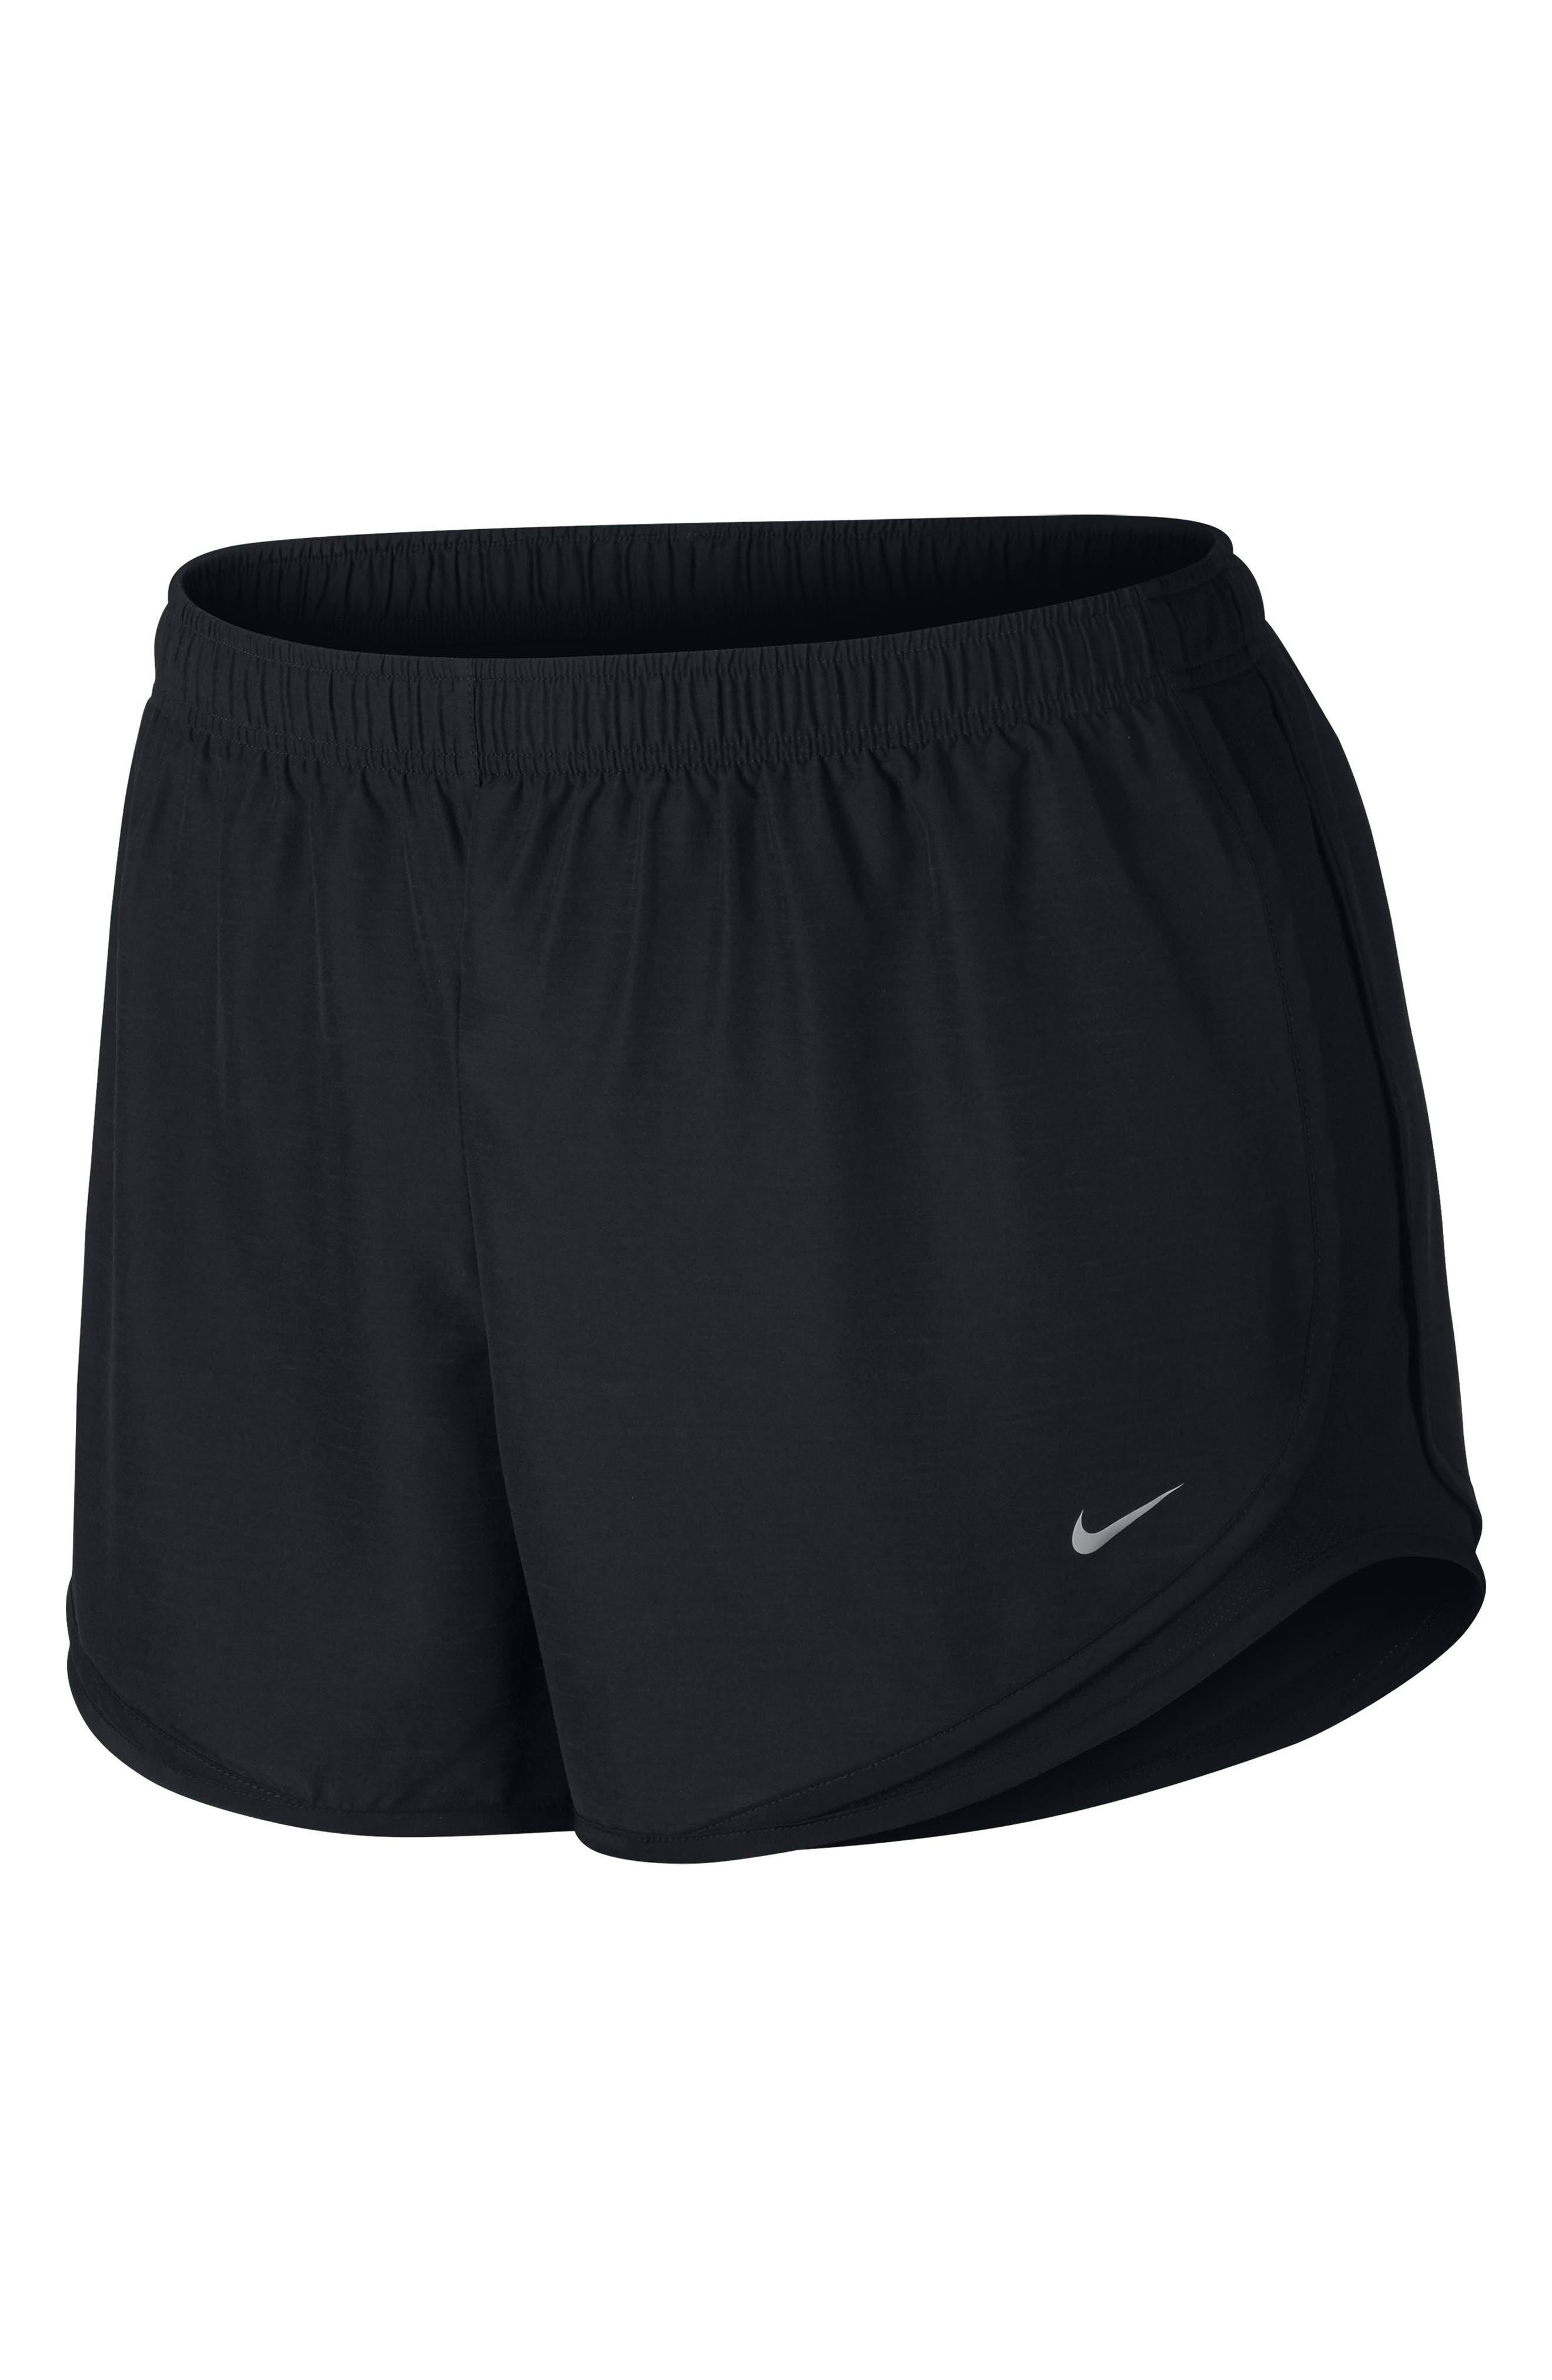 Dry Tempo Running Shorts,                         Main,                         color, BLACK/ BLACK/ WOLF GREY